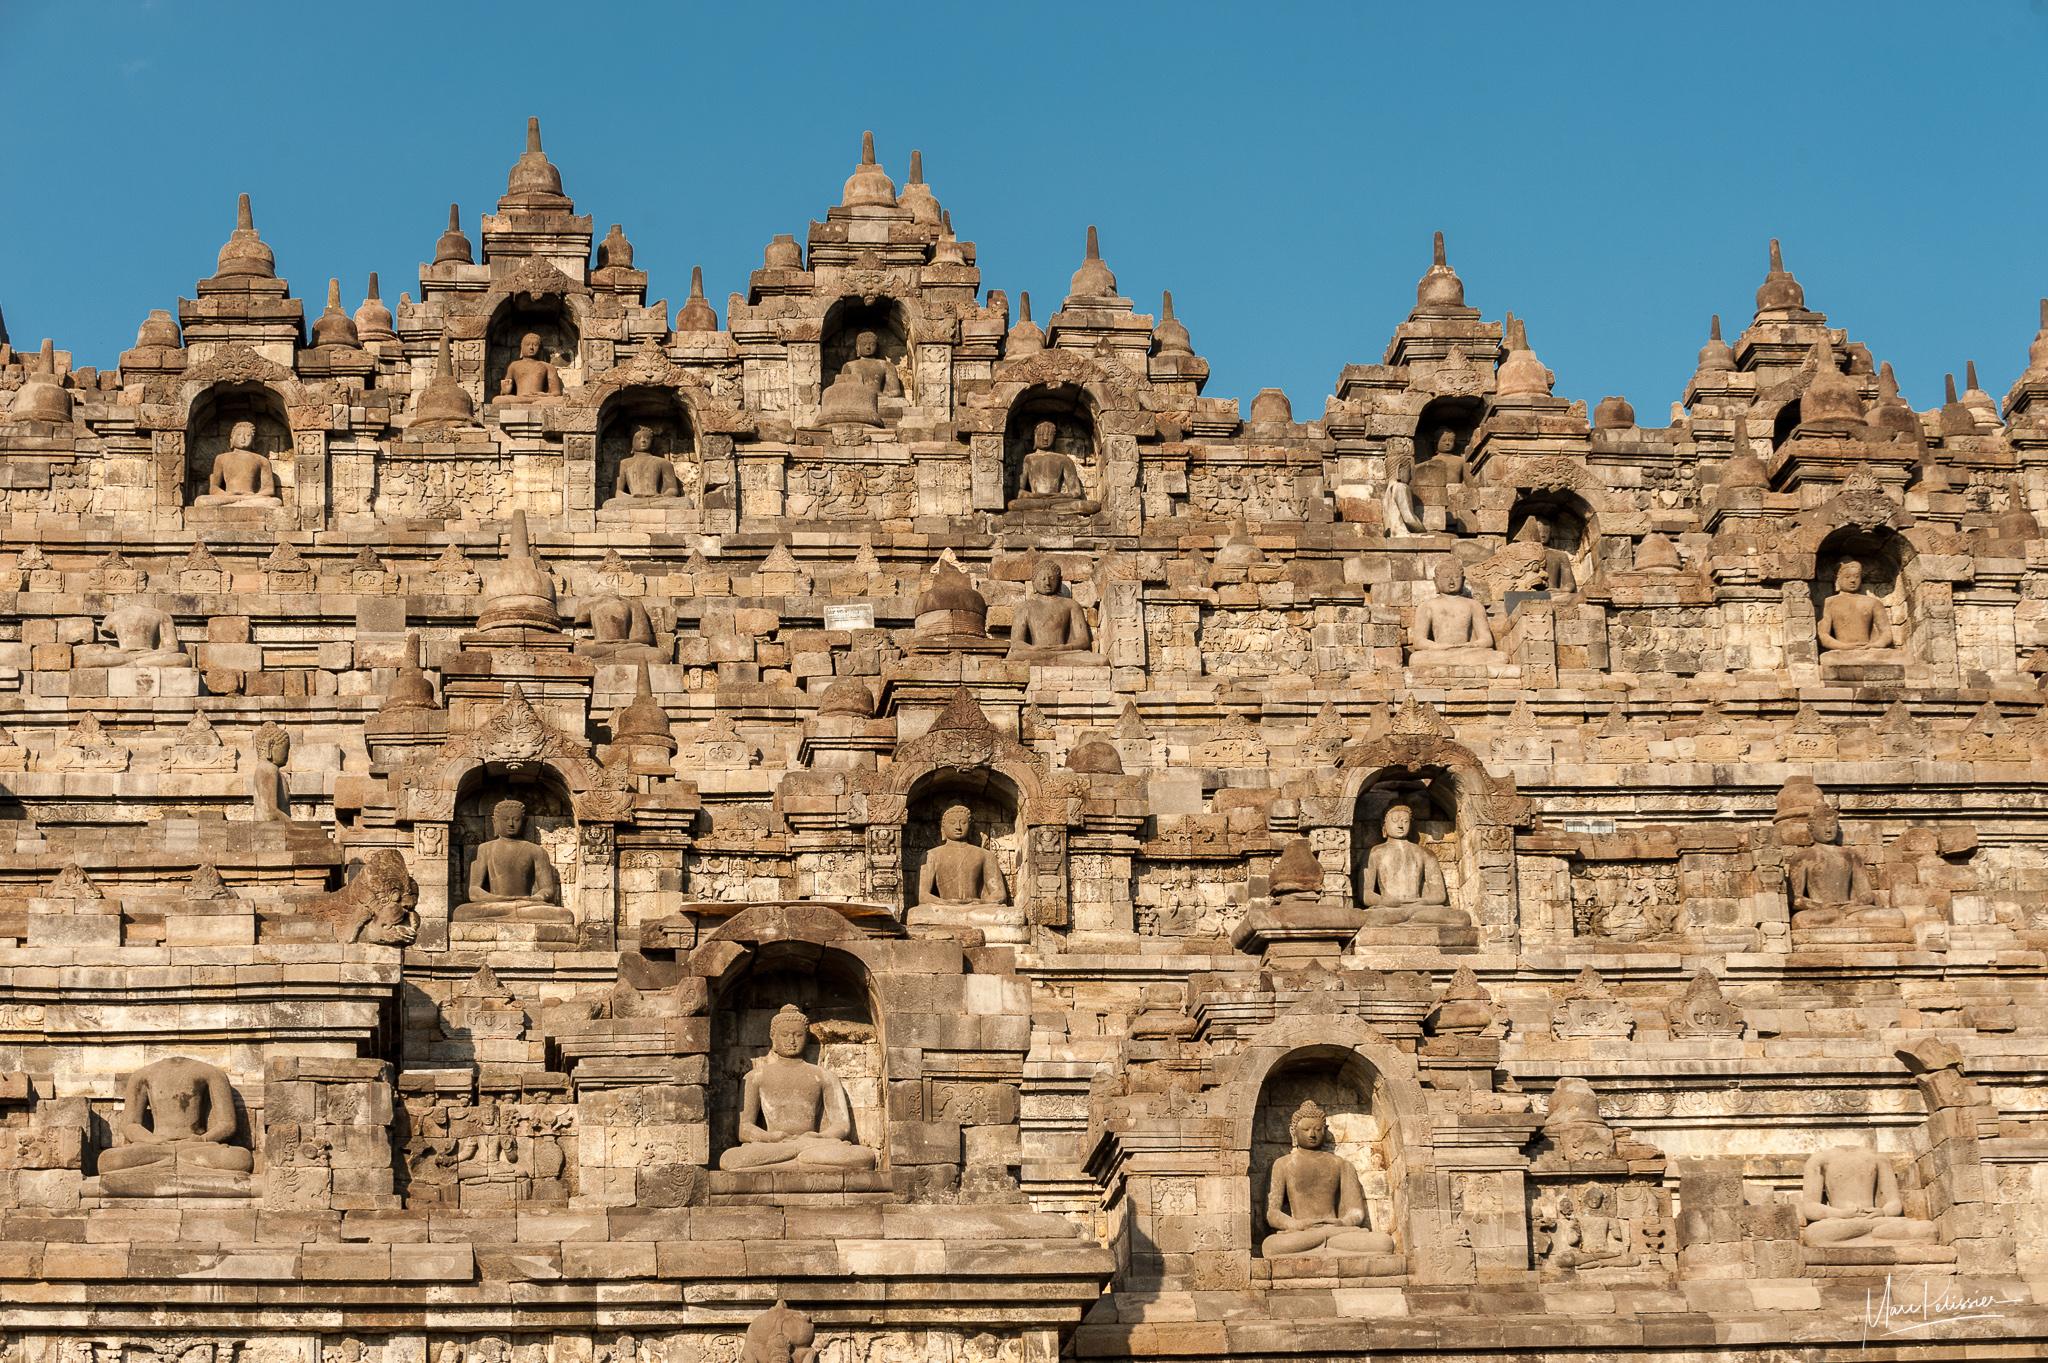 The Buddha pyramid, Indonesia